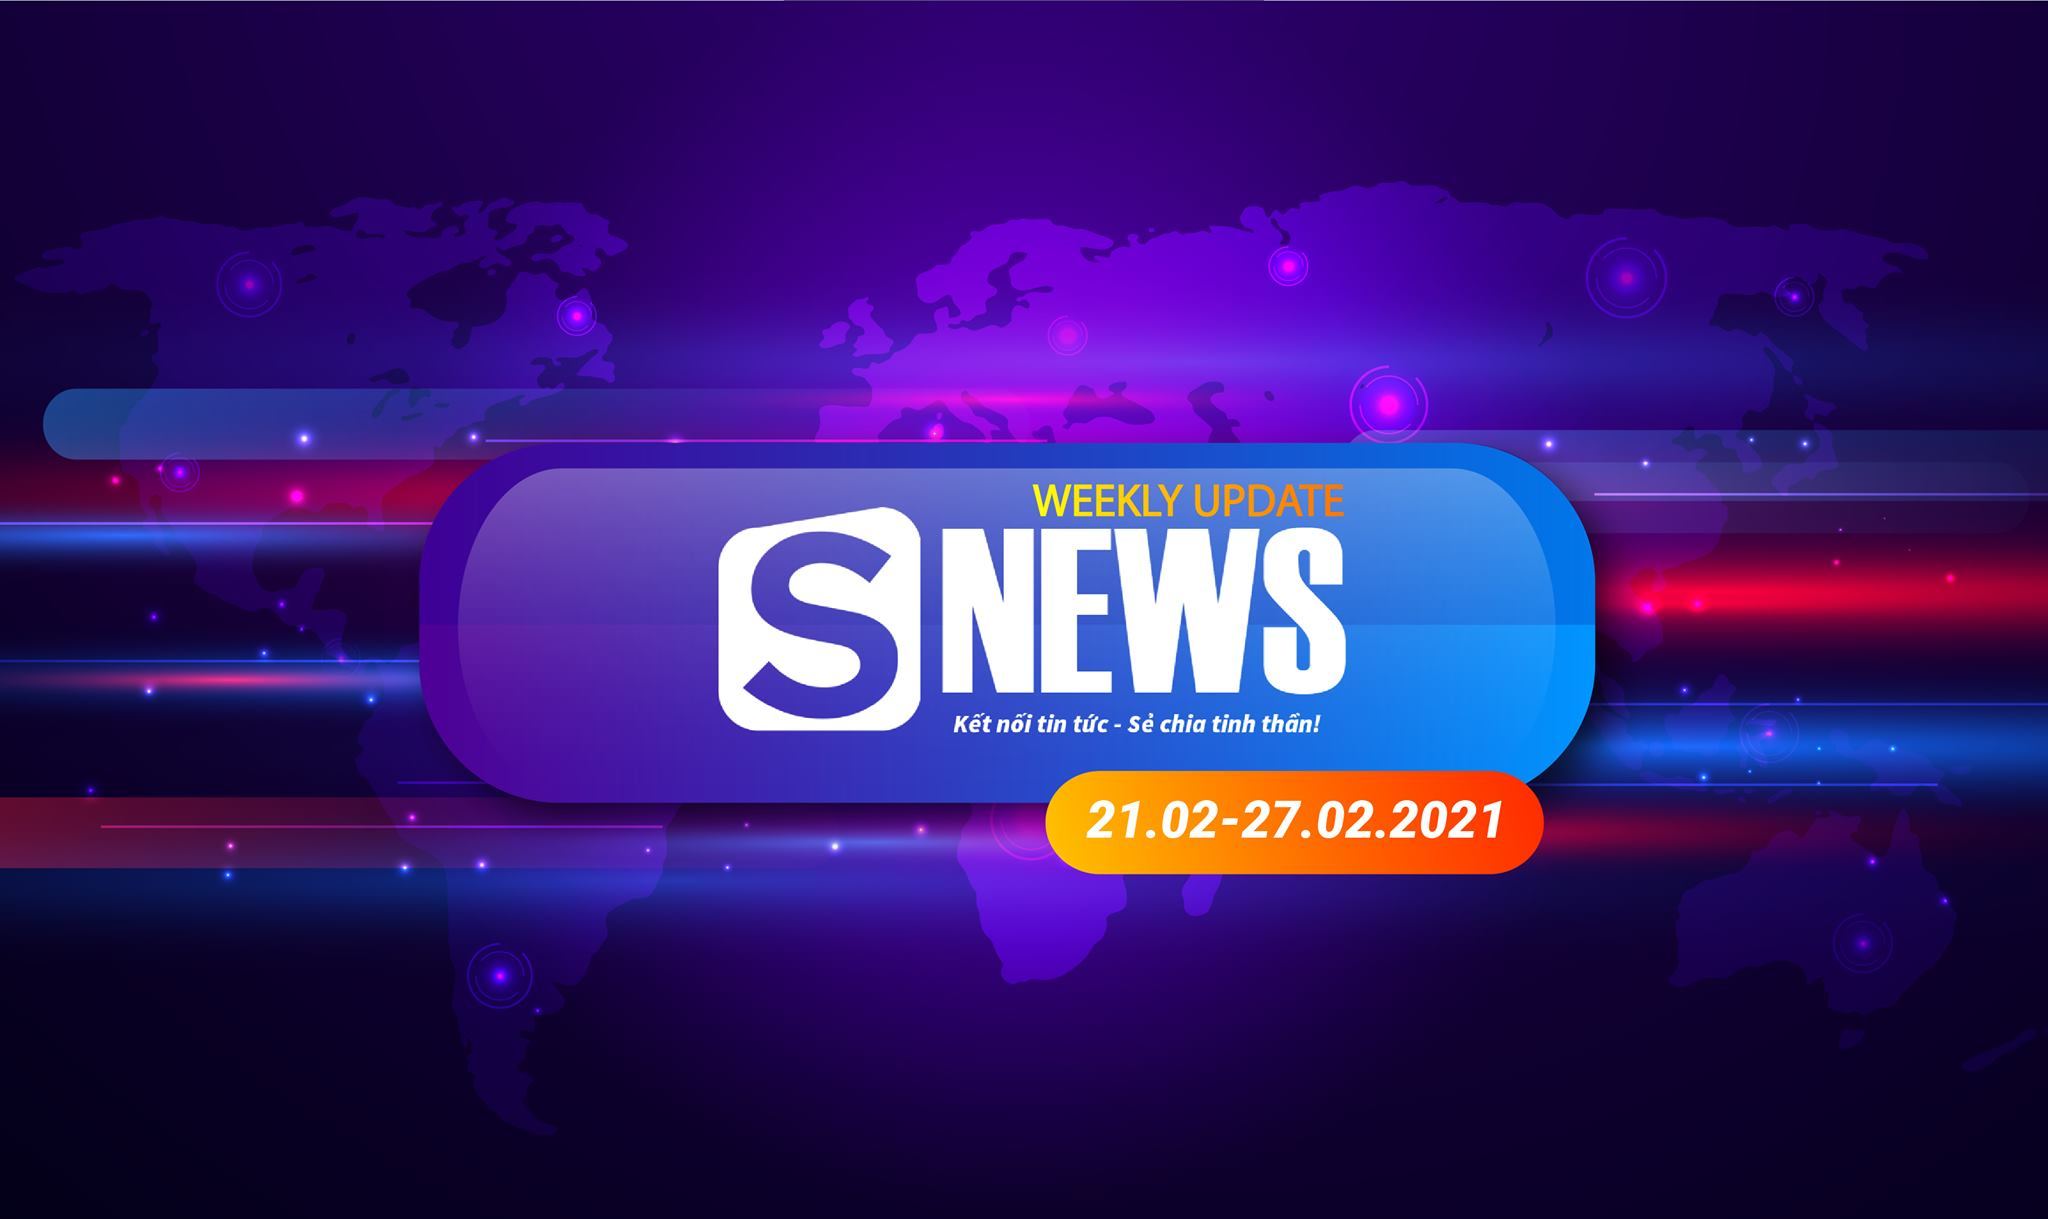 Tổng hợp tin tức Sapo tuần qua: 14.02 - 20.02.2021